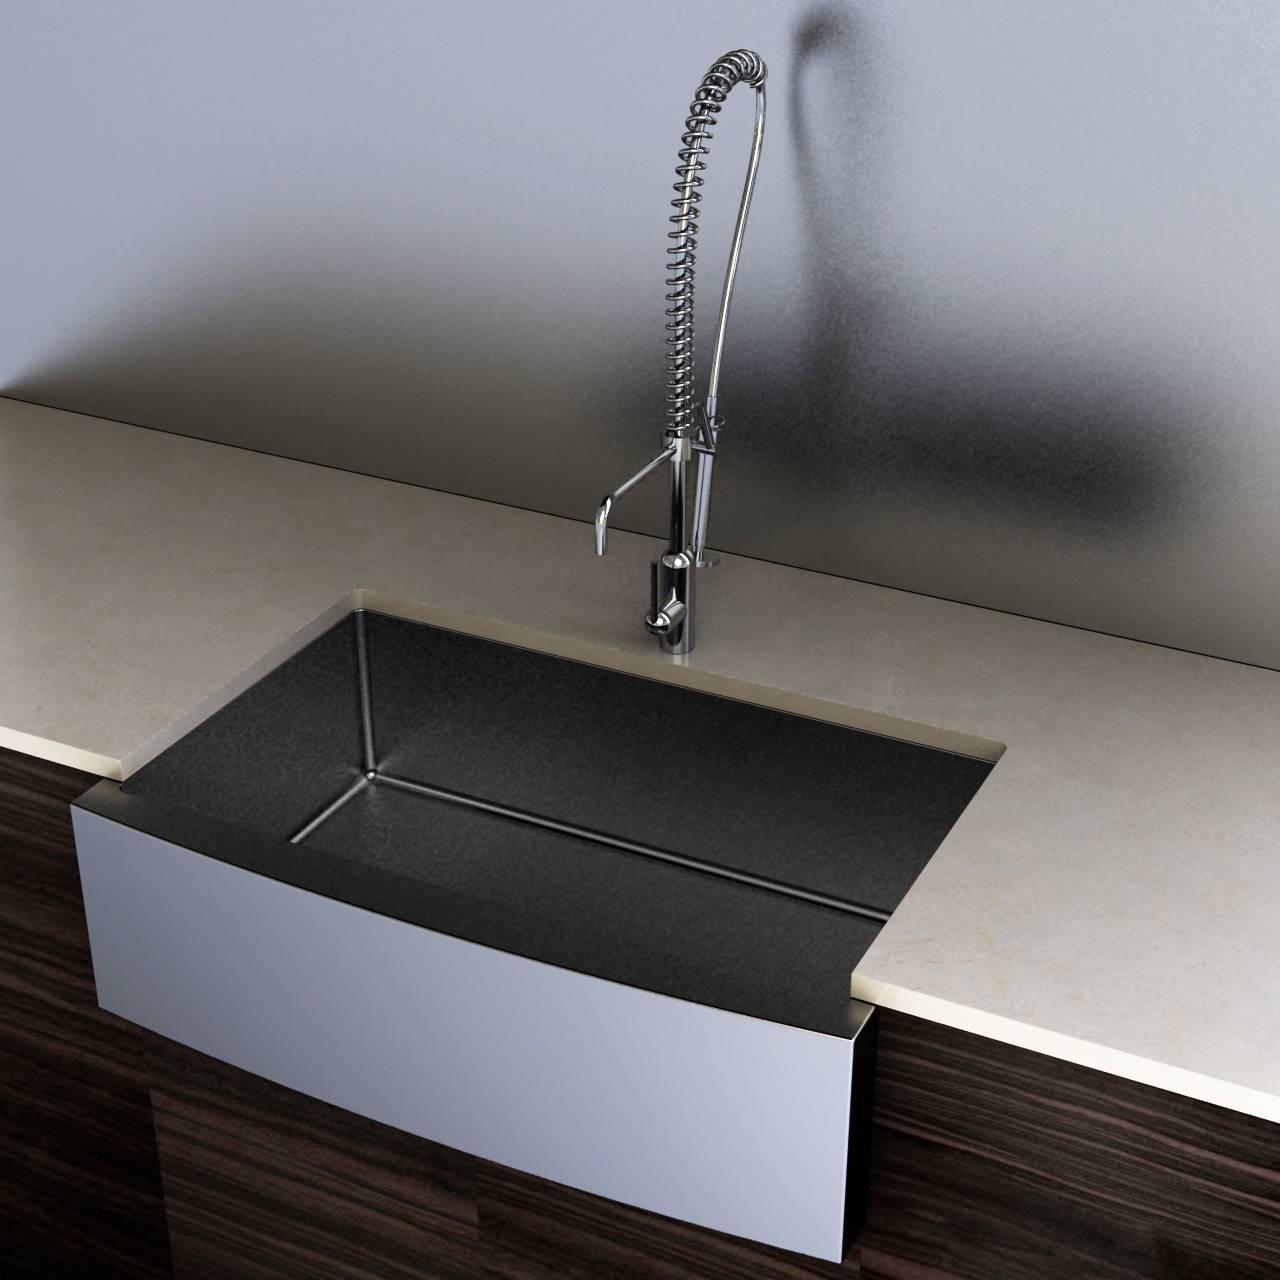 Ideas, blanco kitchen faucet aerator blanco kitchen faucet aerator kitchen sinks delta kitchen sink faucet installation bathroom 1280 x 1280  .